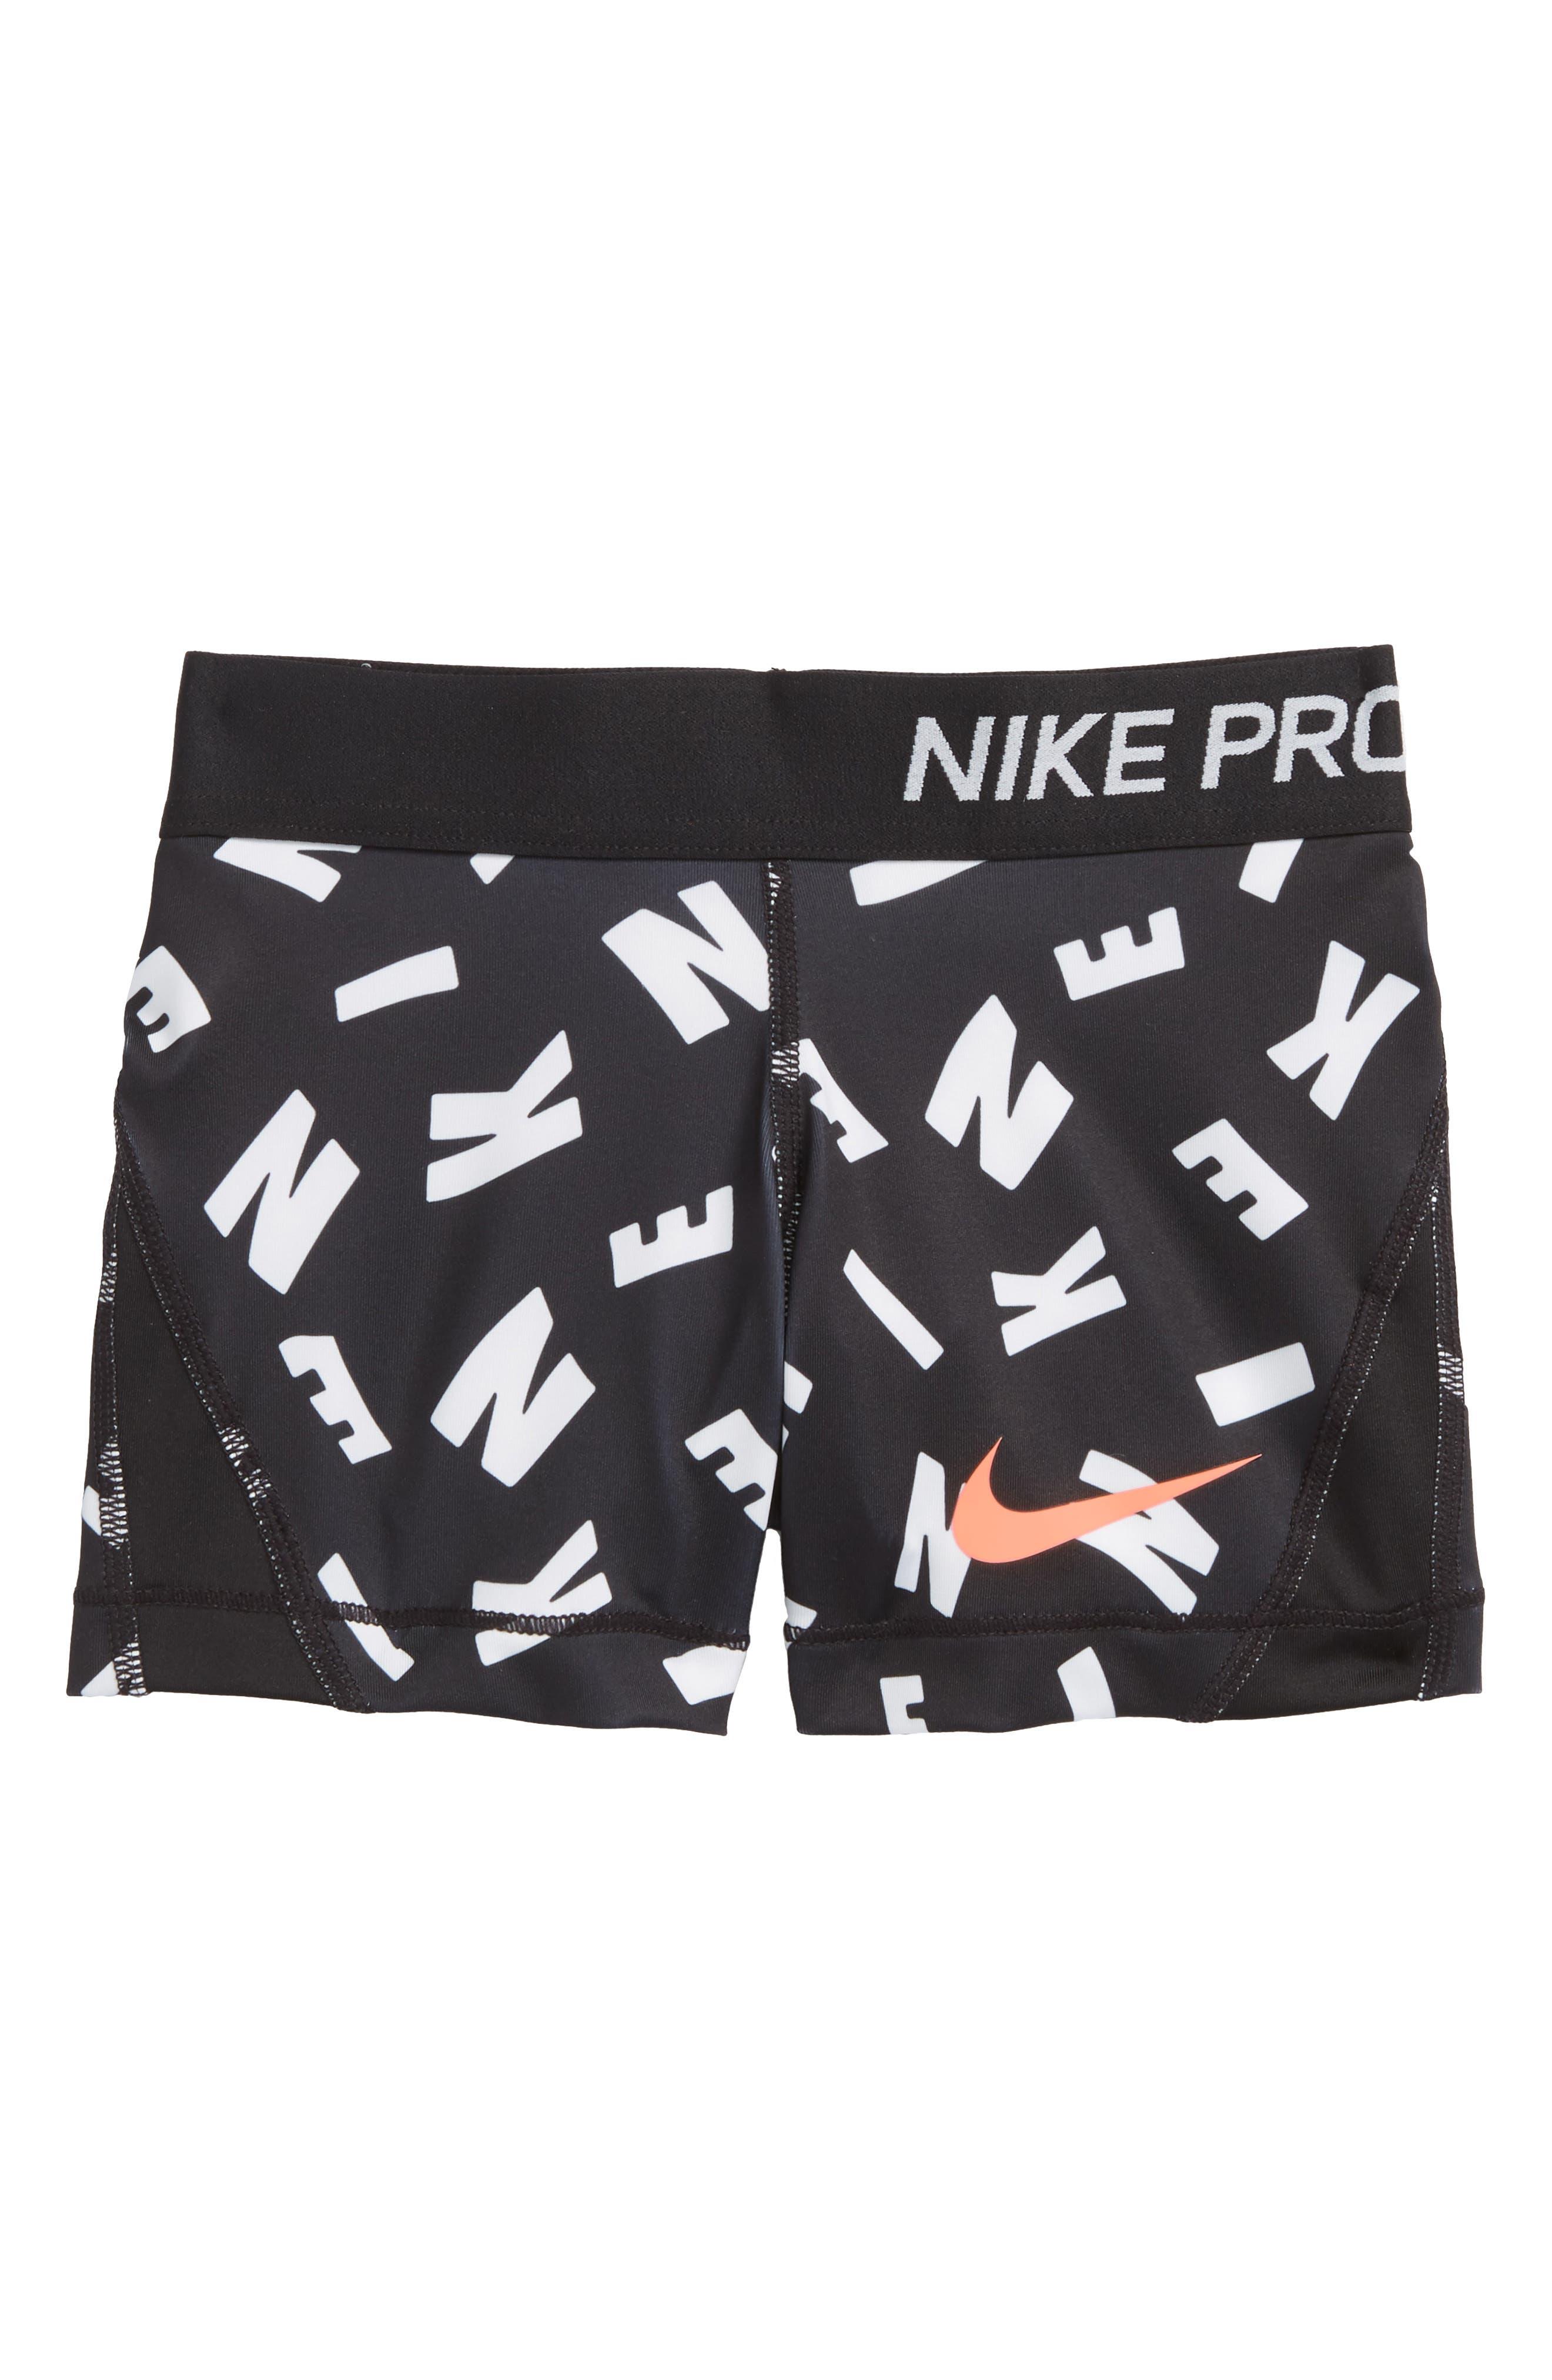 Pro Dry Shorts,                             Main thumbnail 1, color,                             010